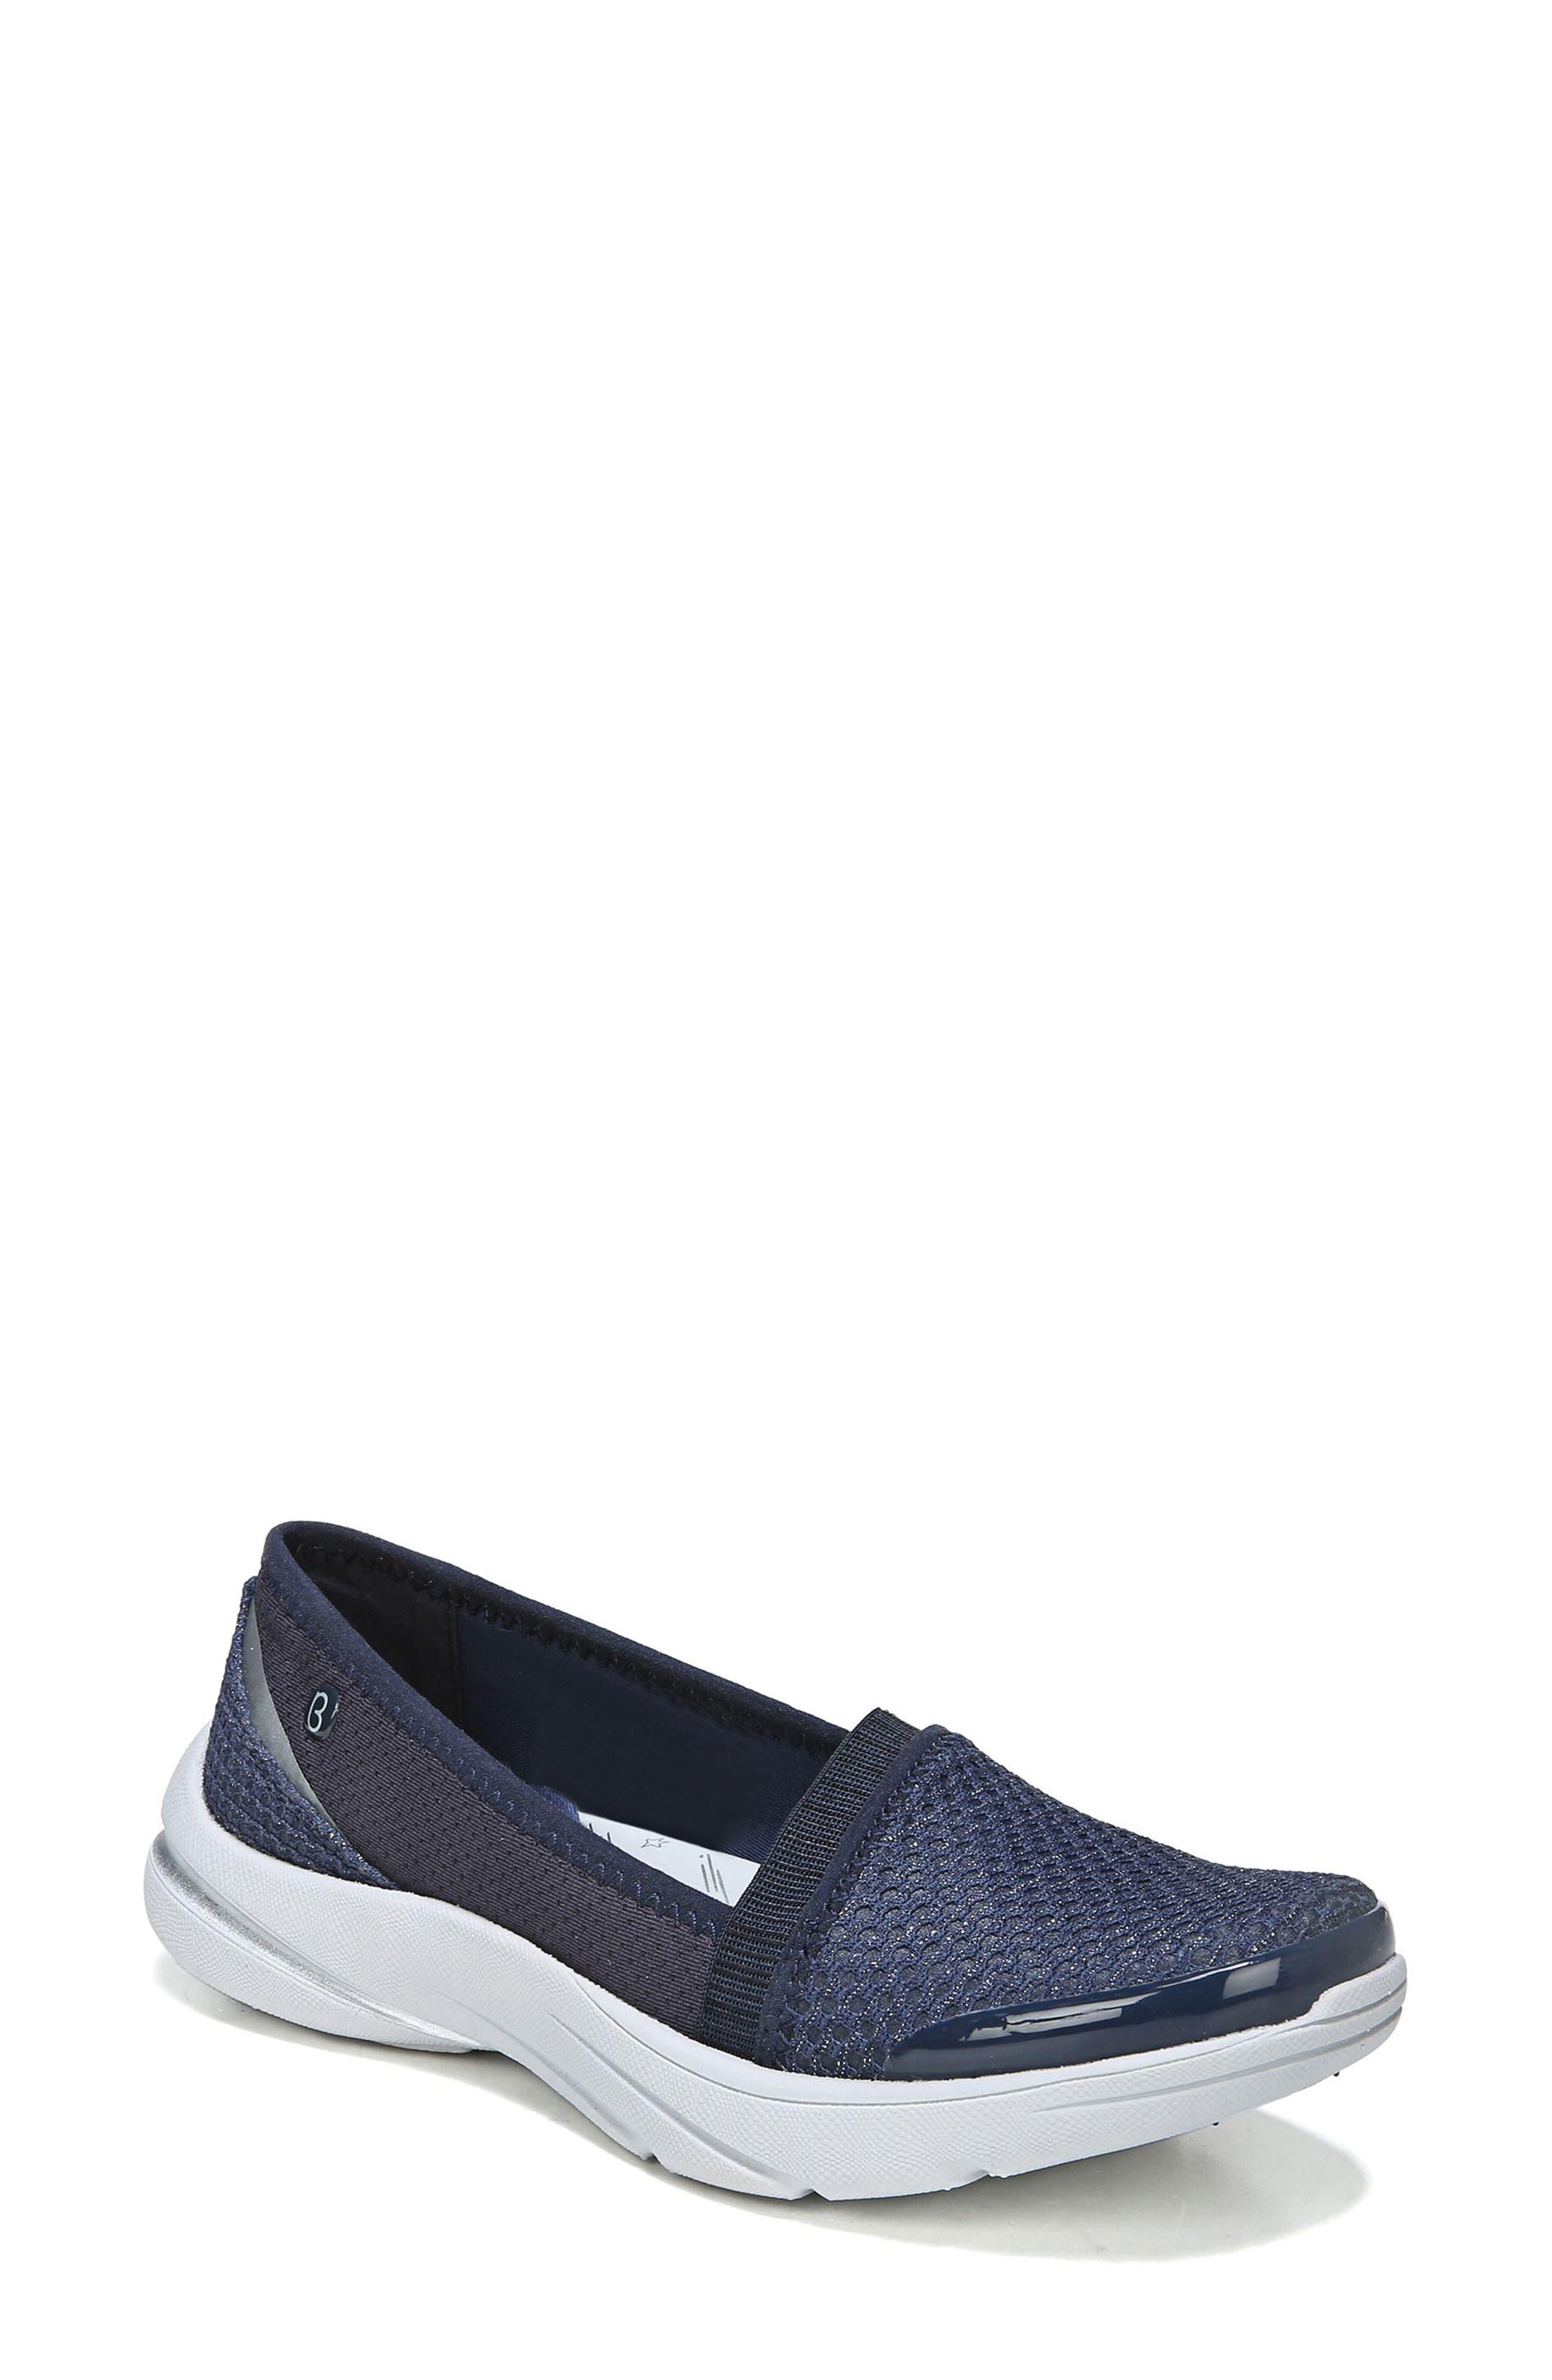 Alternate Image 1 Selected - BZees Lollipop Slip-On Sneaker (Women)